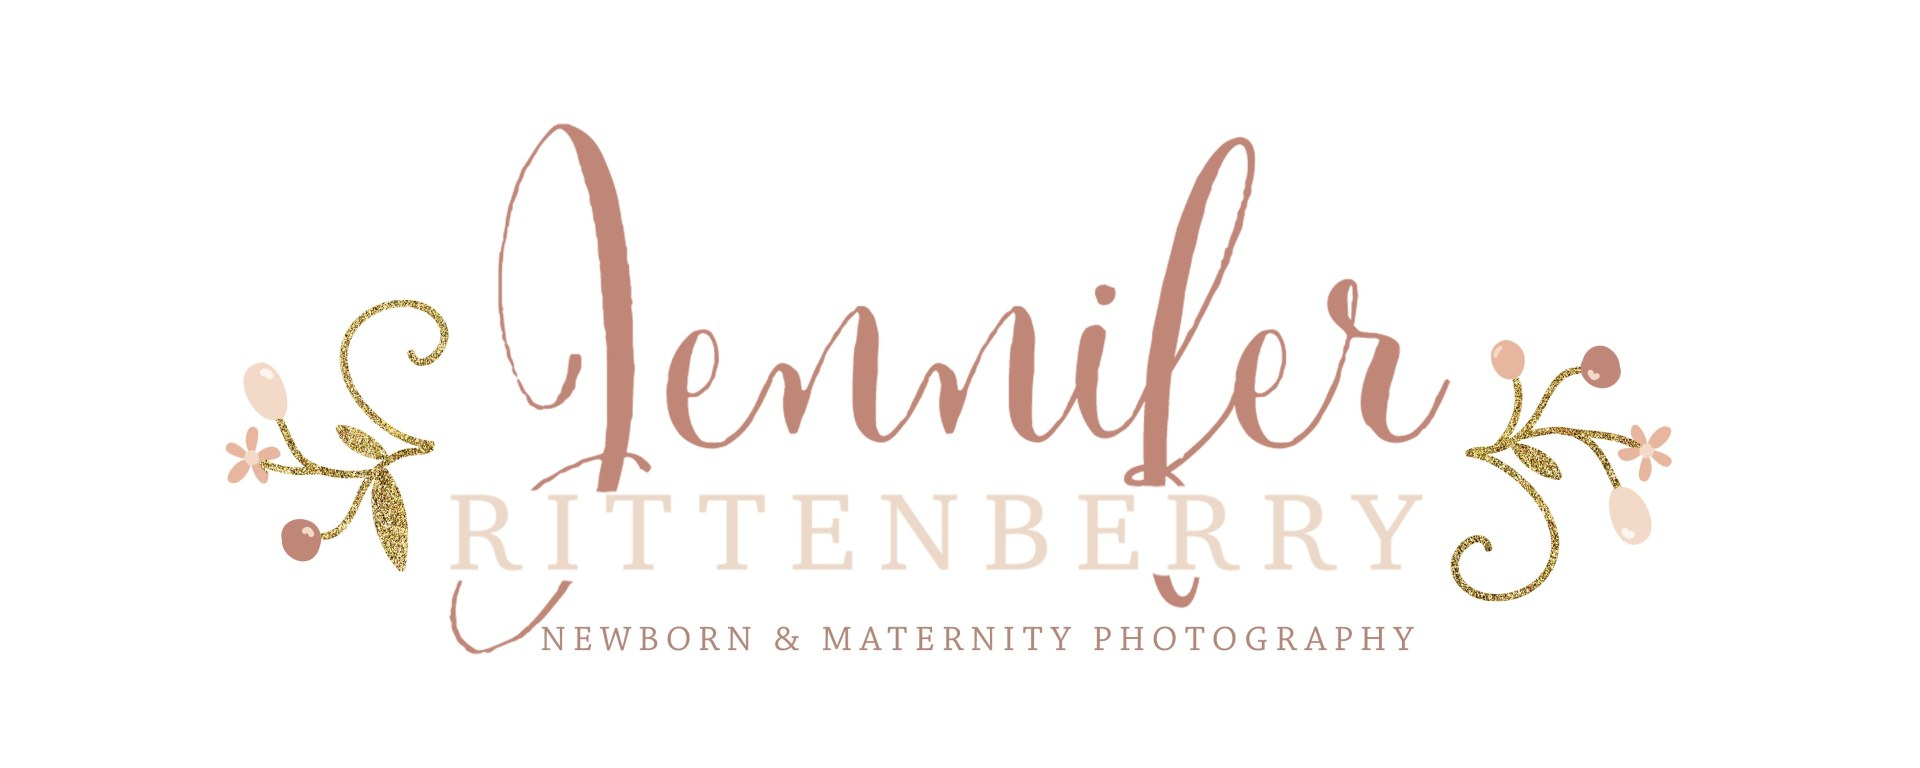 Mount Washington Kentucky and Louisville Maternity & Newborn Photographer   Jennifer Rittenberry Photography   www.jlritt.com